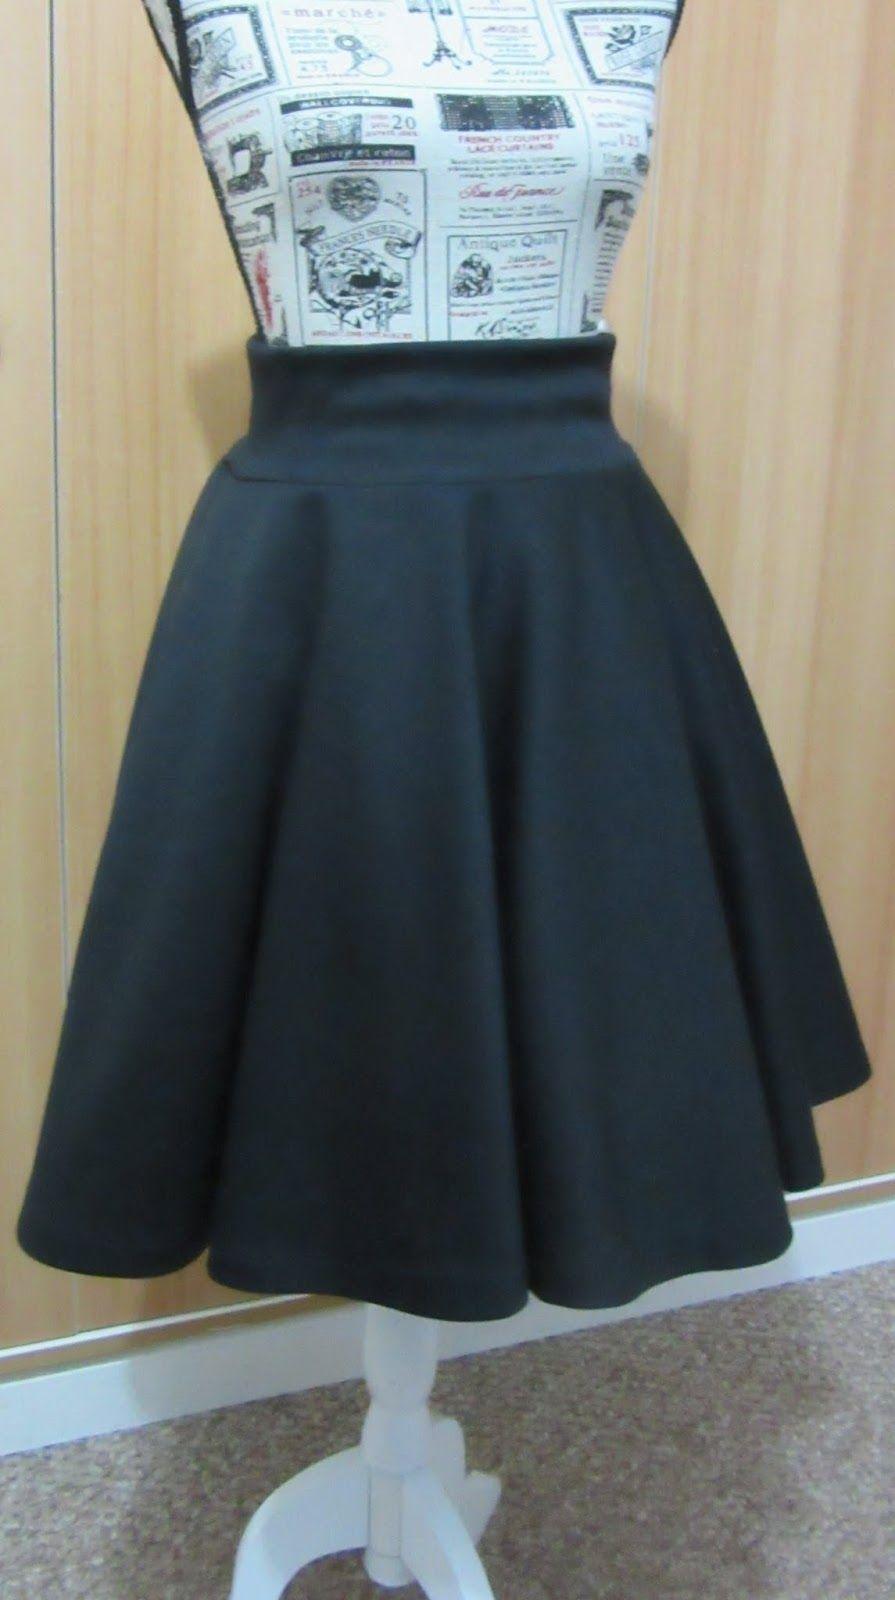 6b0720b95 Mini Falda Plato con tela elástica | ropa | Faldas, Faldas ...